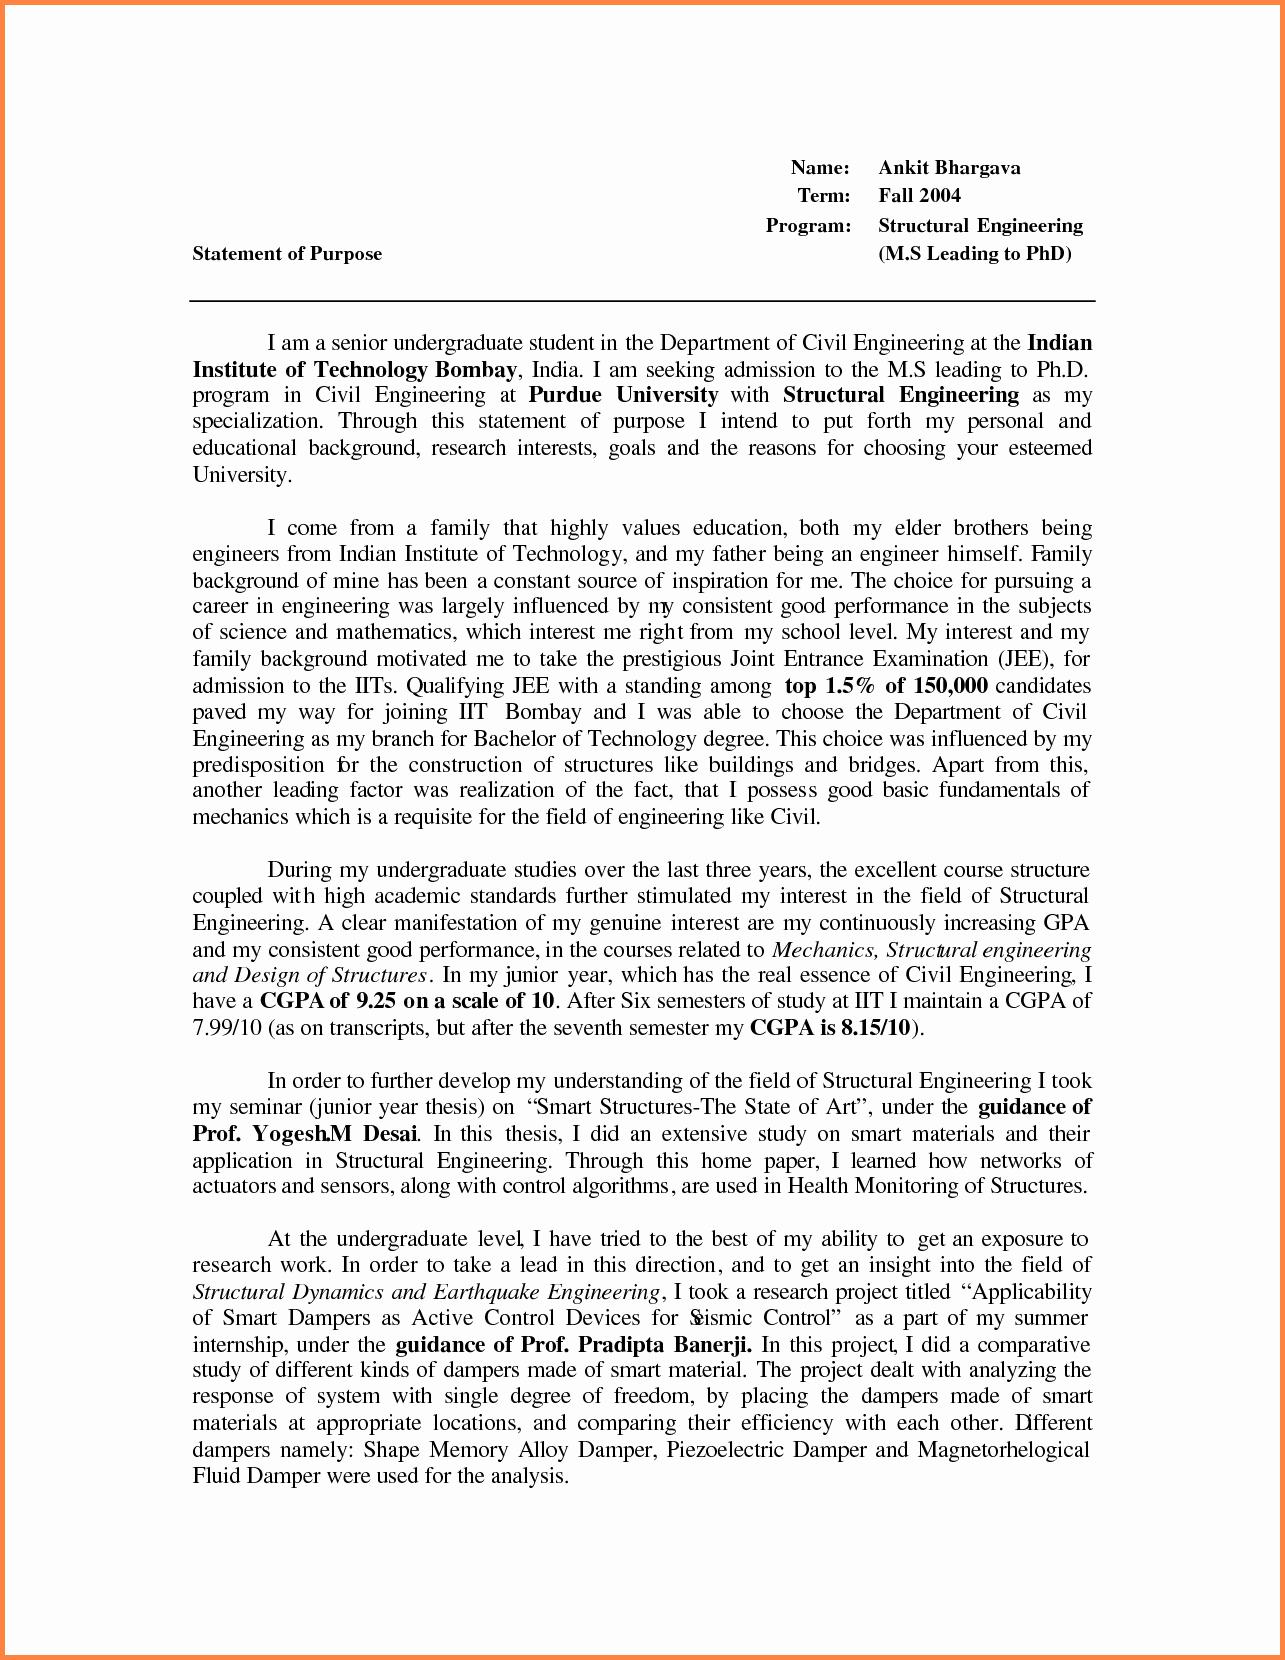 Statement Of Purpose Letter Beautiful Statement Of Purpose Letter Graduate School sop